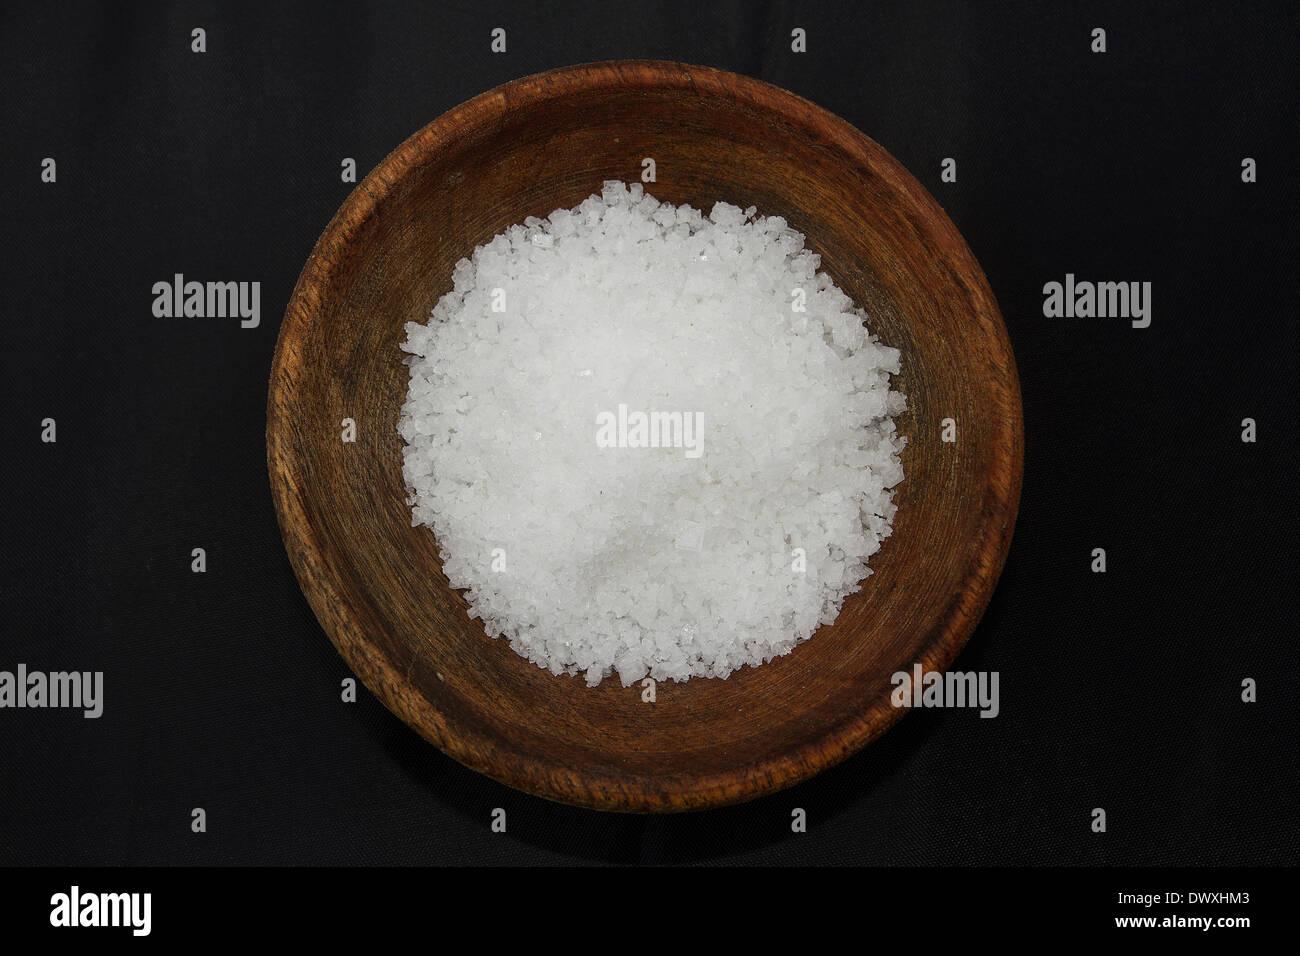 wooden bowl of Epsom Salts - Stock Image